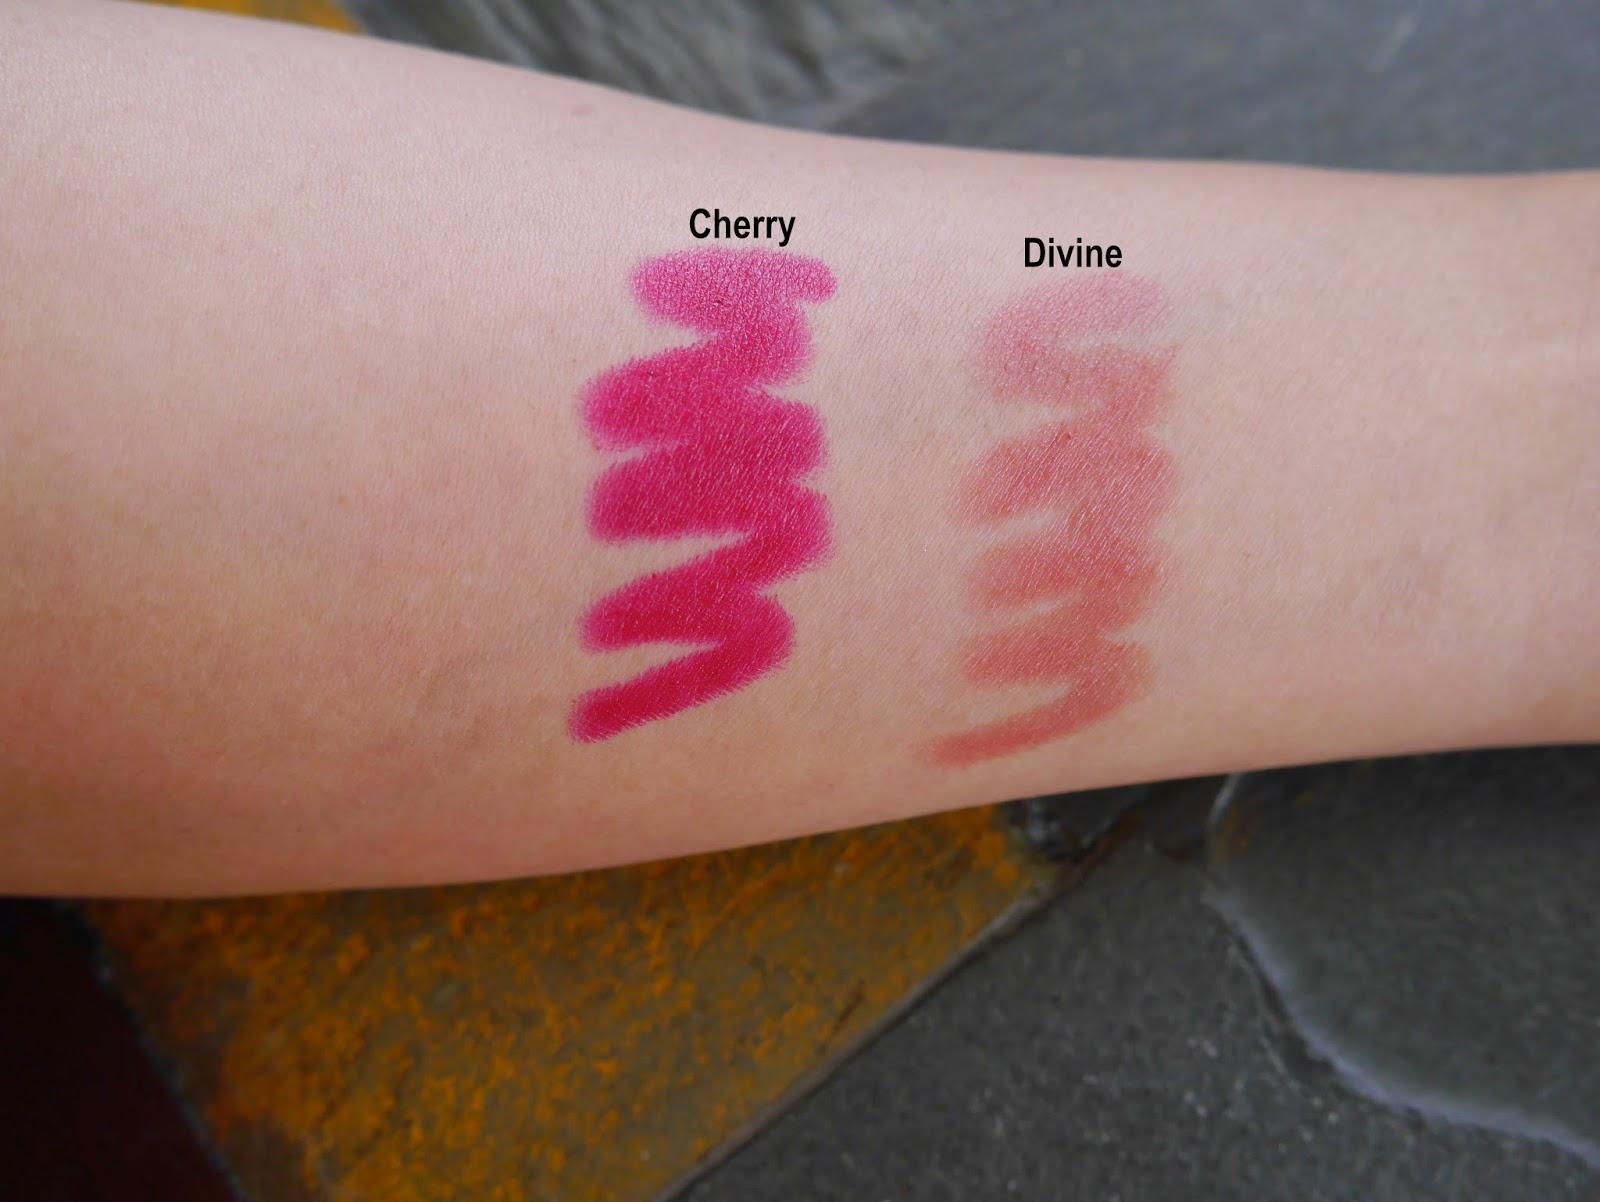 Cherry, Divine